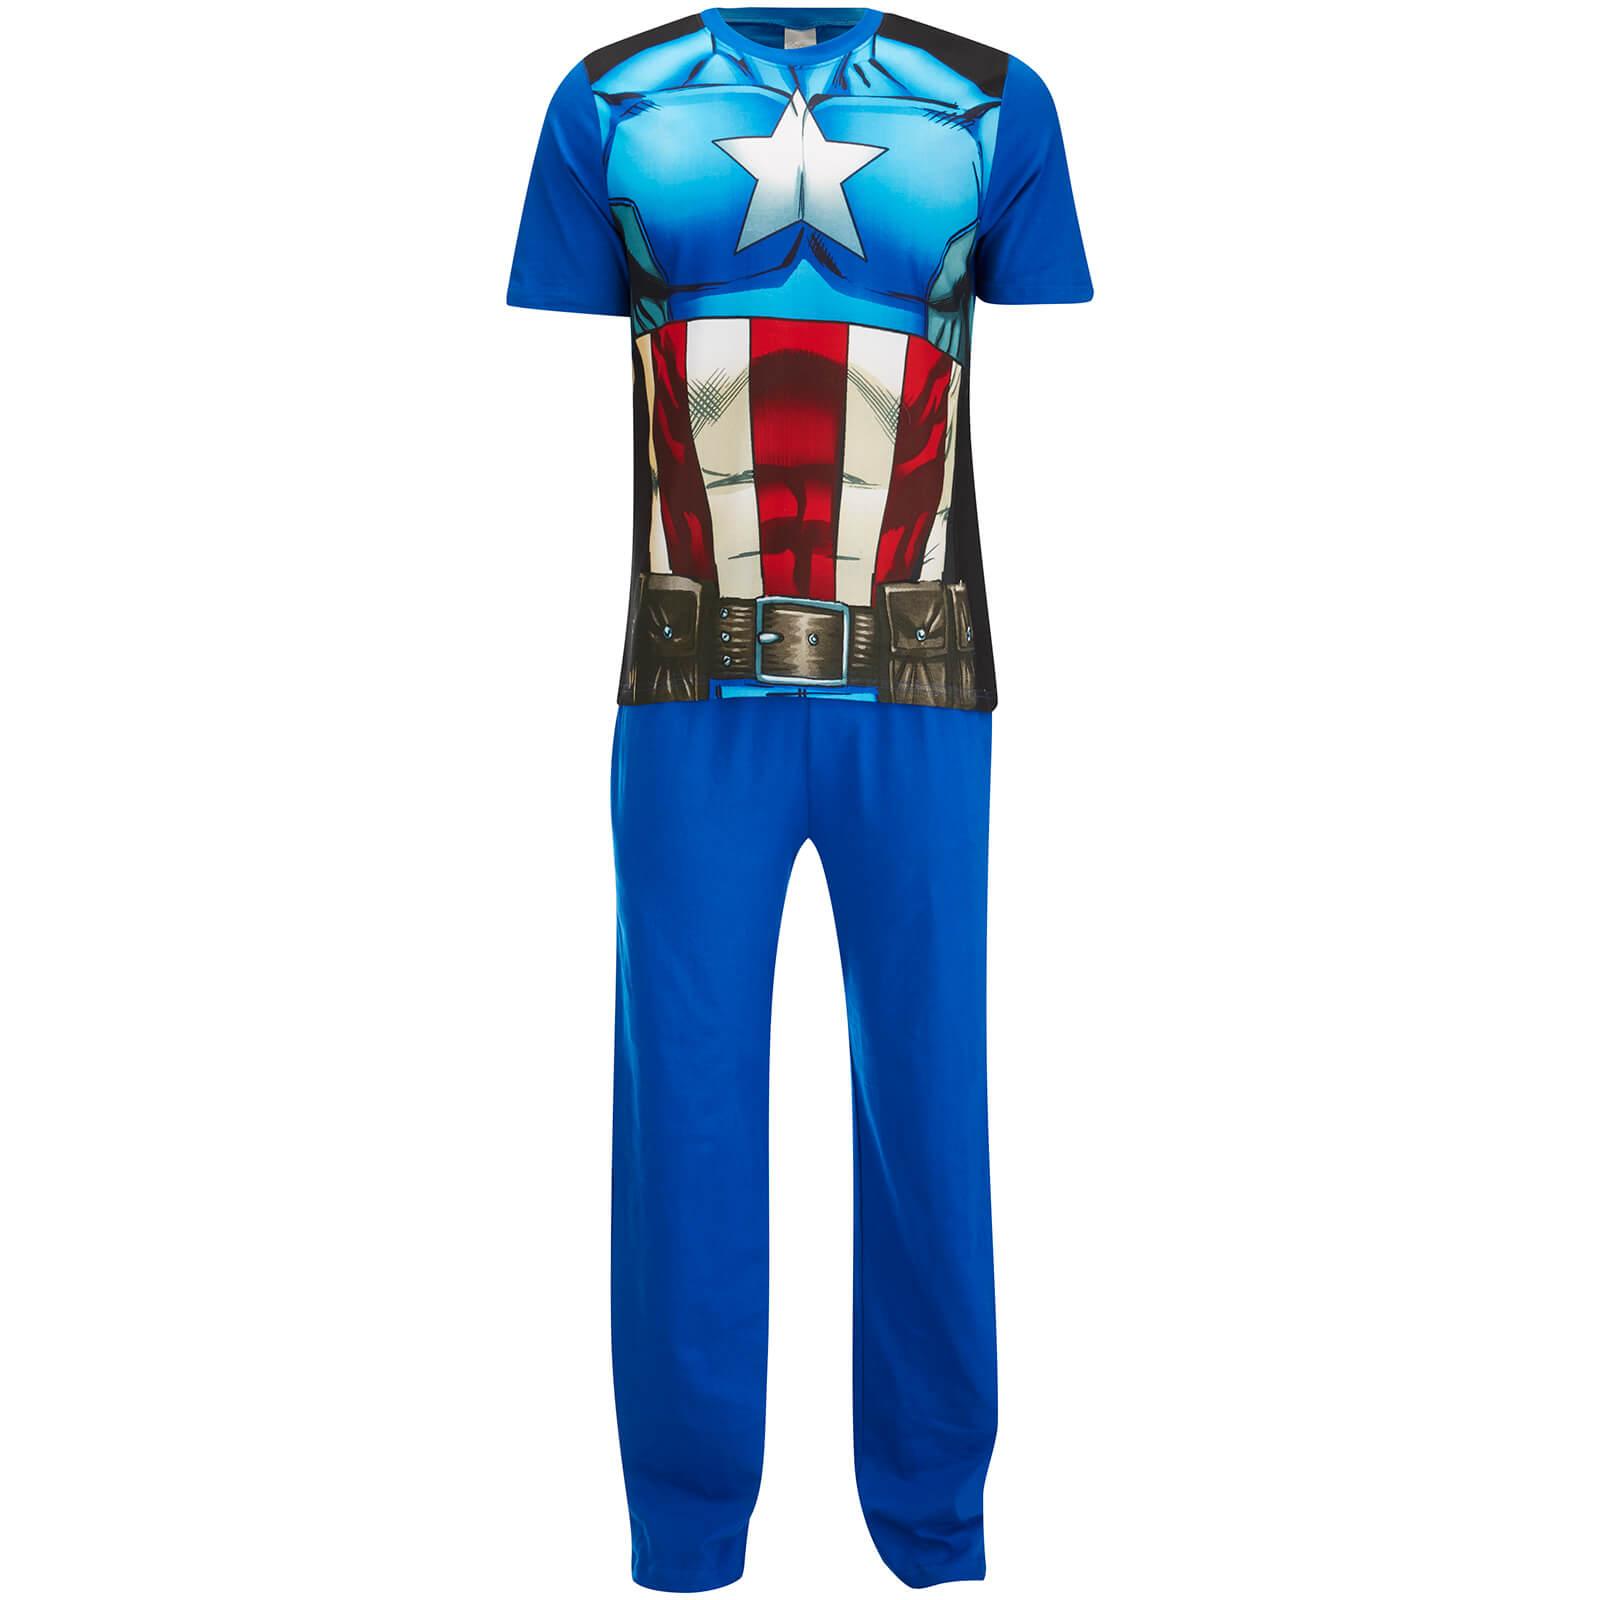 capitan pijama hombre america del del pijama 0OtO7R